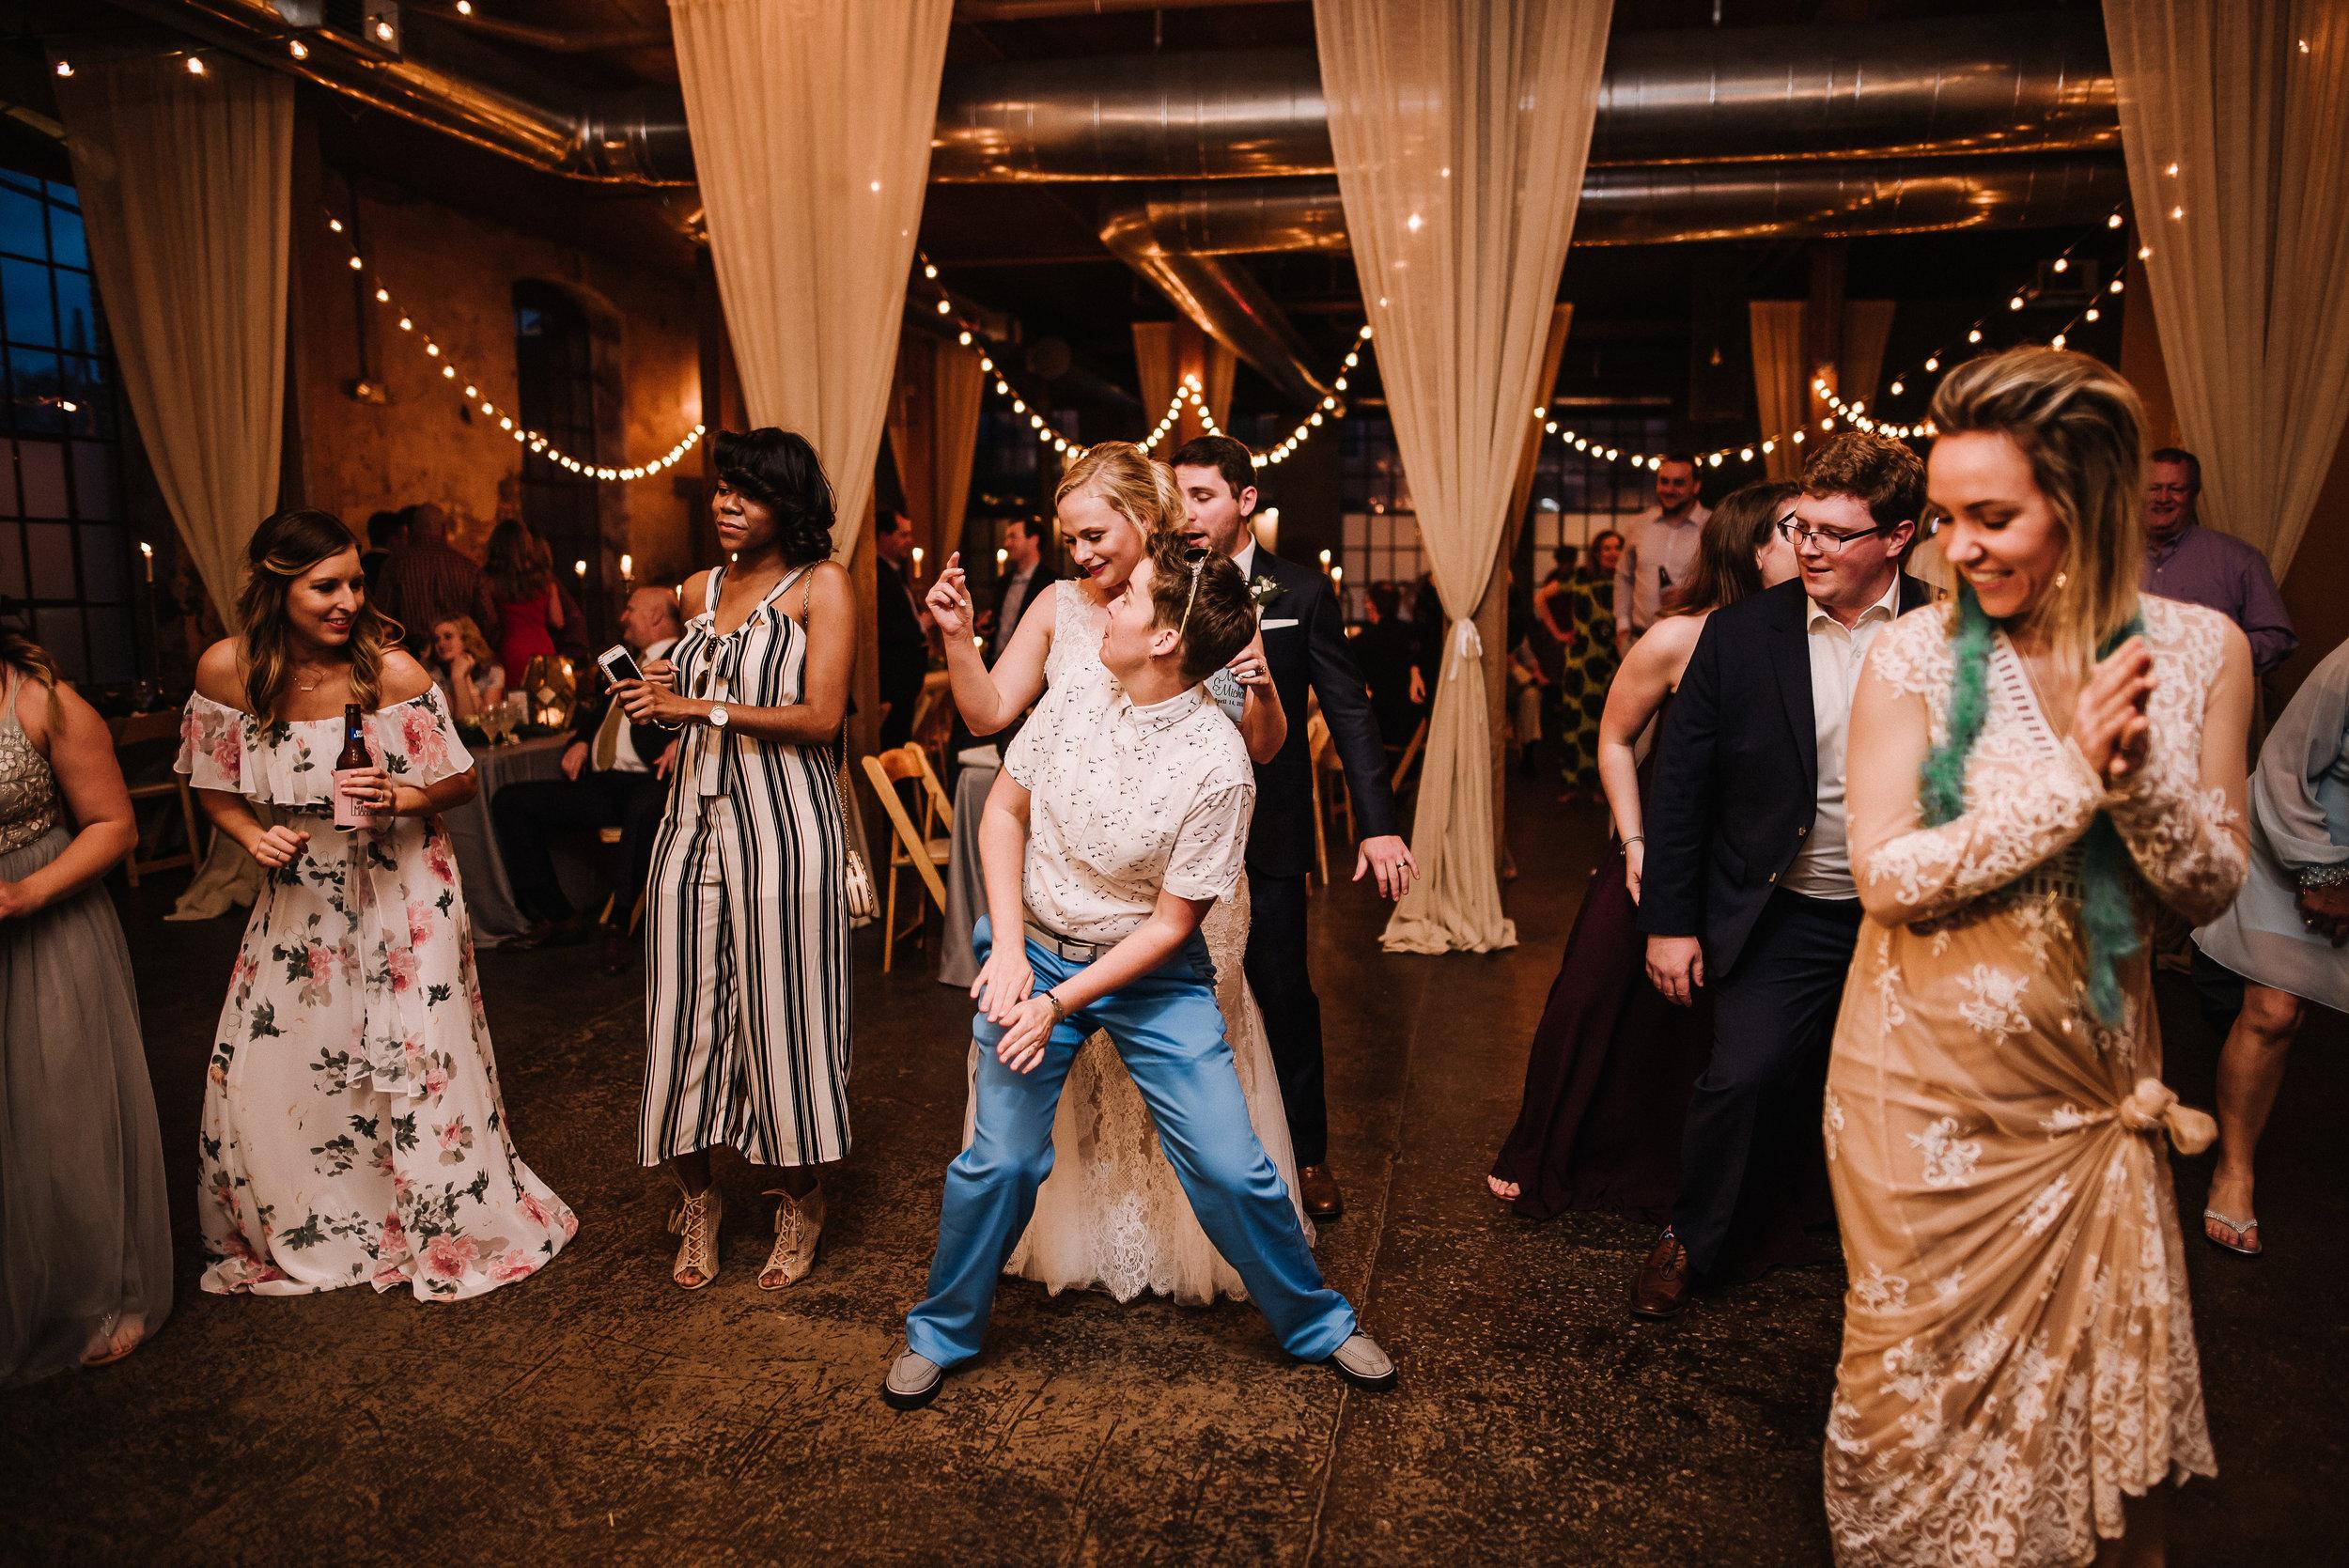 Morgan Wedding_Mill at Yellow River_Ashley Benham Photography-1108.jpg